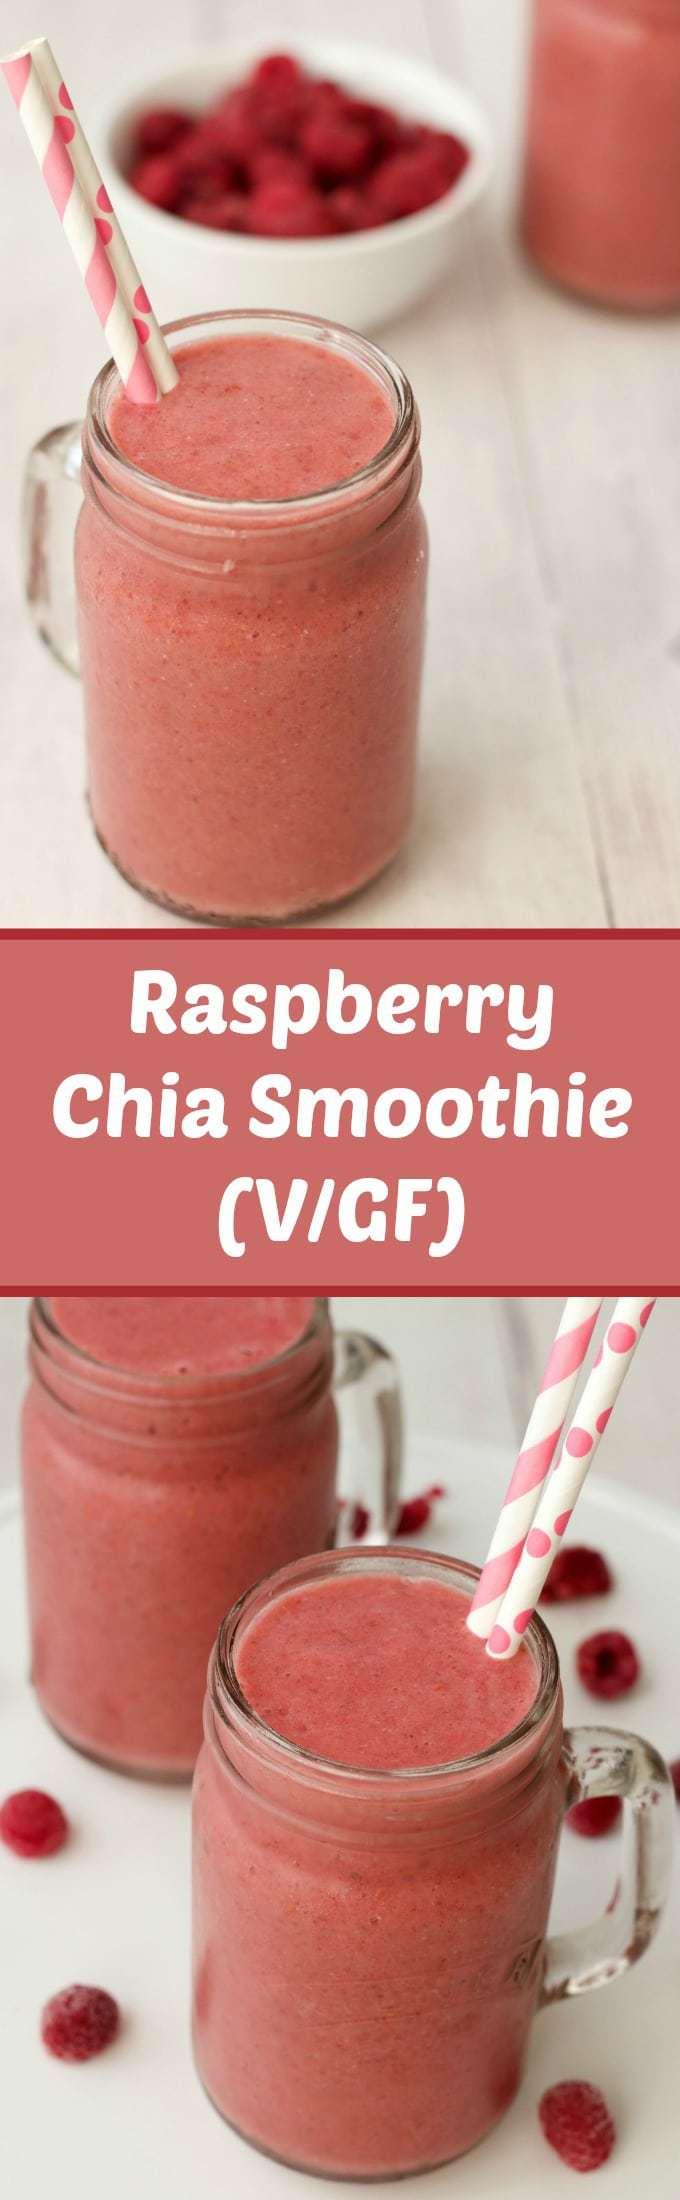 Raspberry Chia Smoothie #vegan #lovingitvegan #smoothie #chia #glutenfree #dairyfree